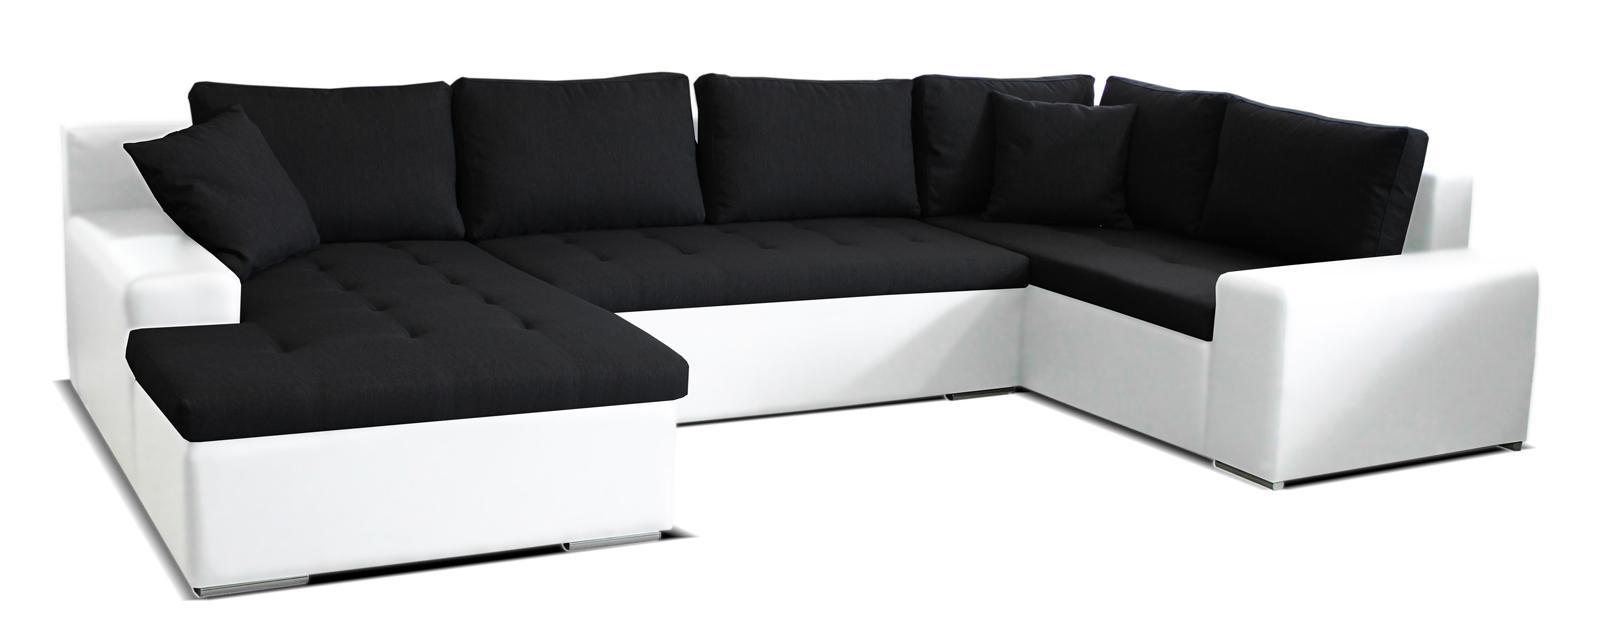 Rohová sedačka U Moreno L+2+BL (čierna + biela) (L)